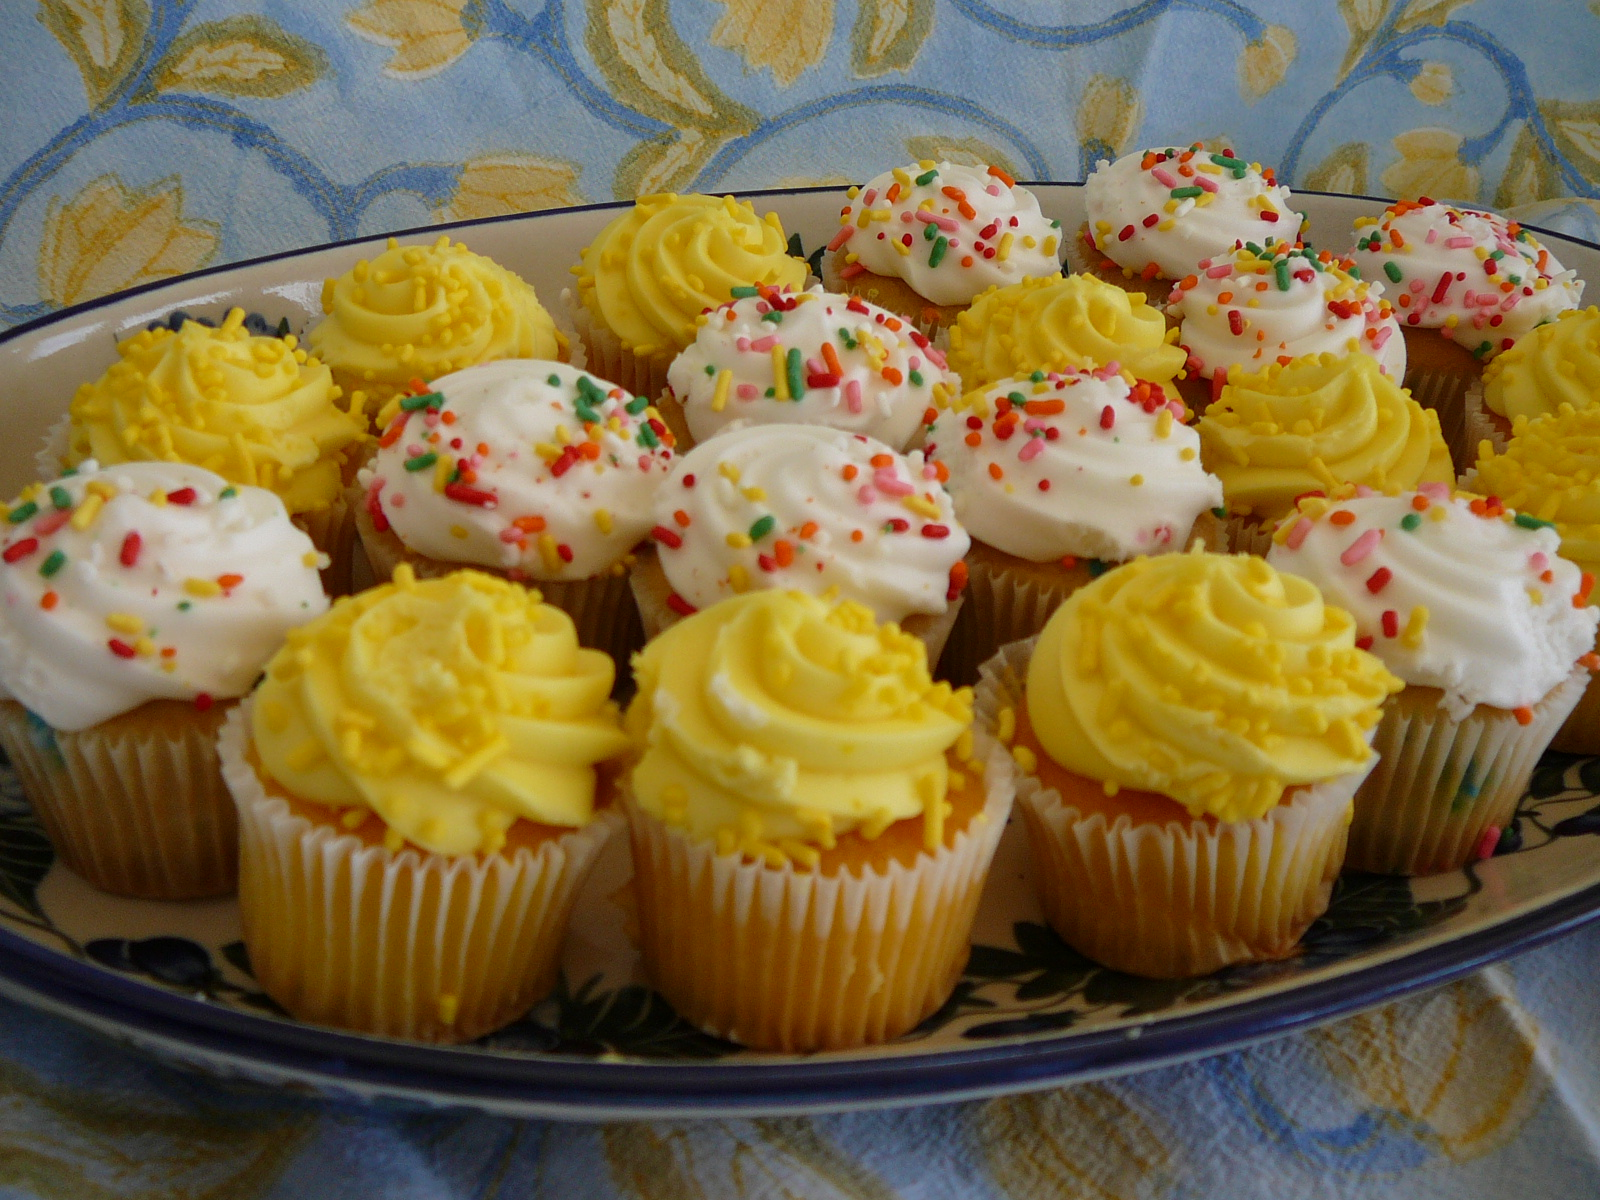 Smart Allergy Friendly Education Maplehurst Bakeries Thaw and